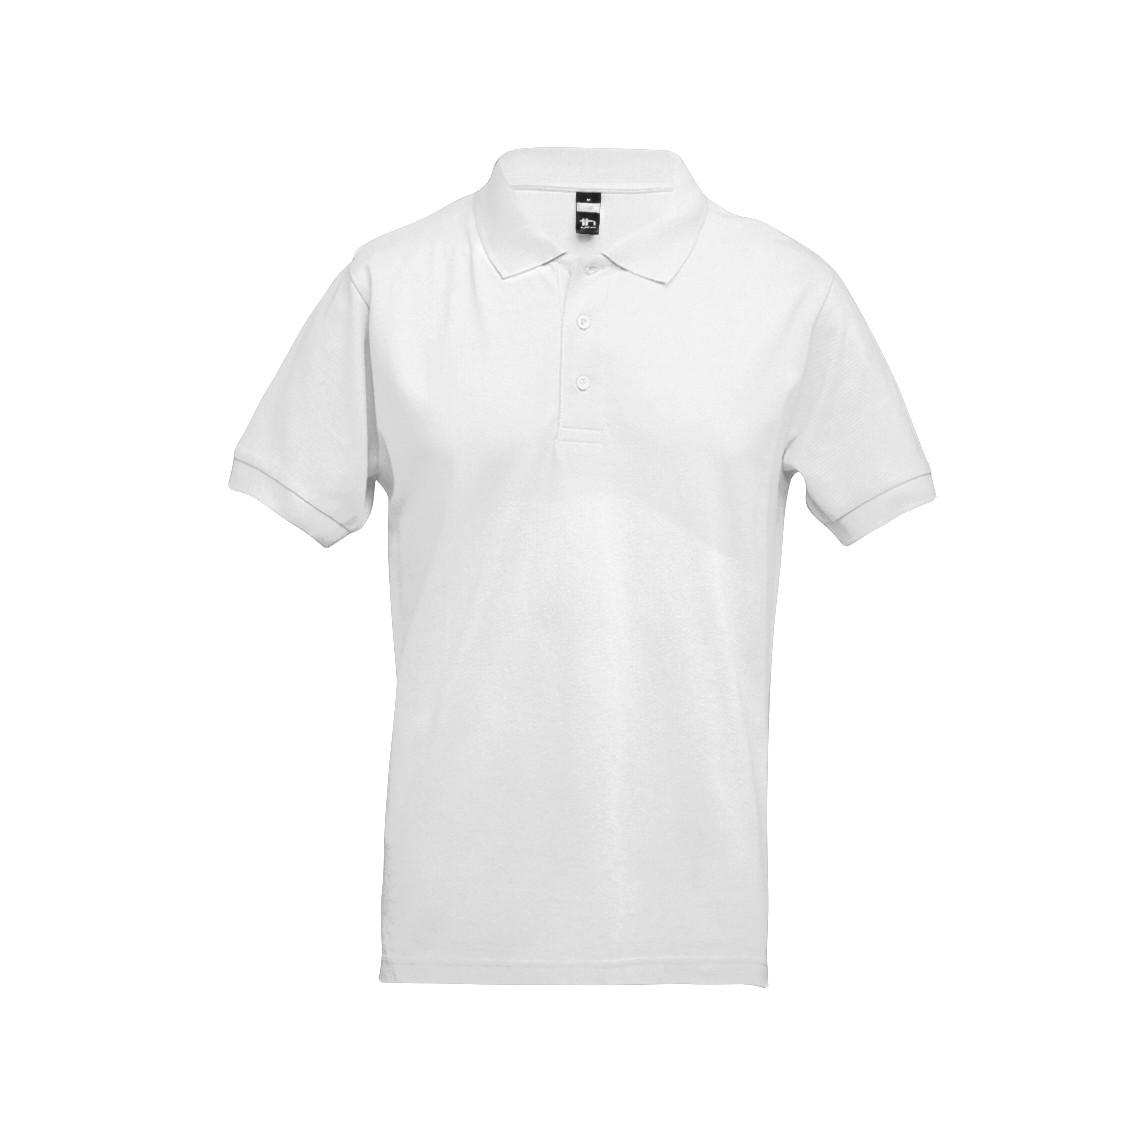 ADAM. Men's polo shirt - White / S